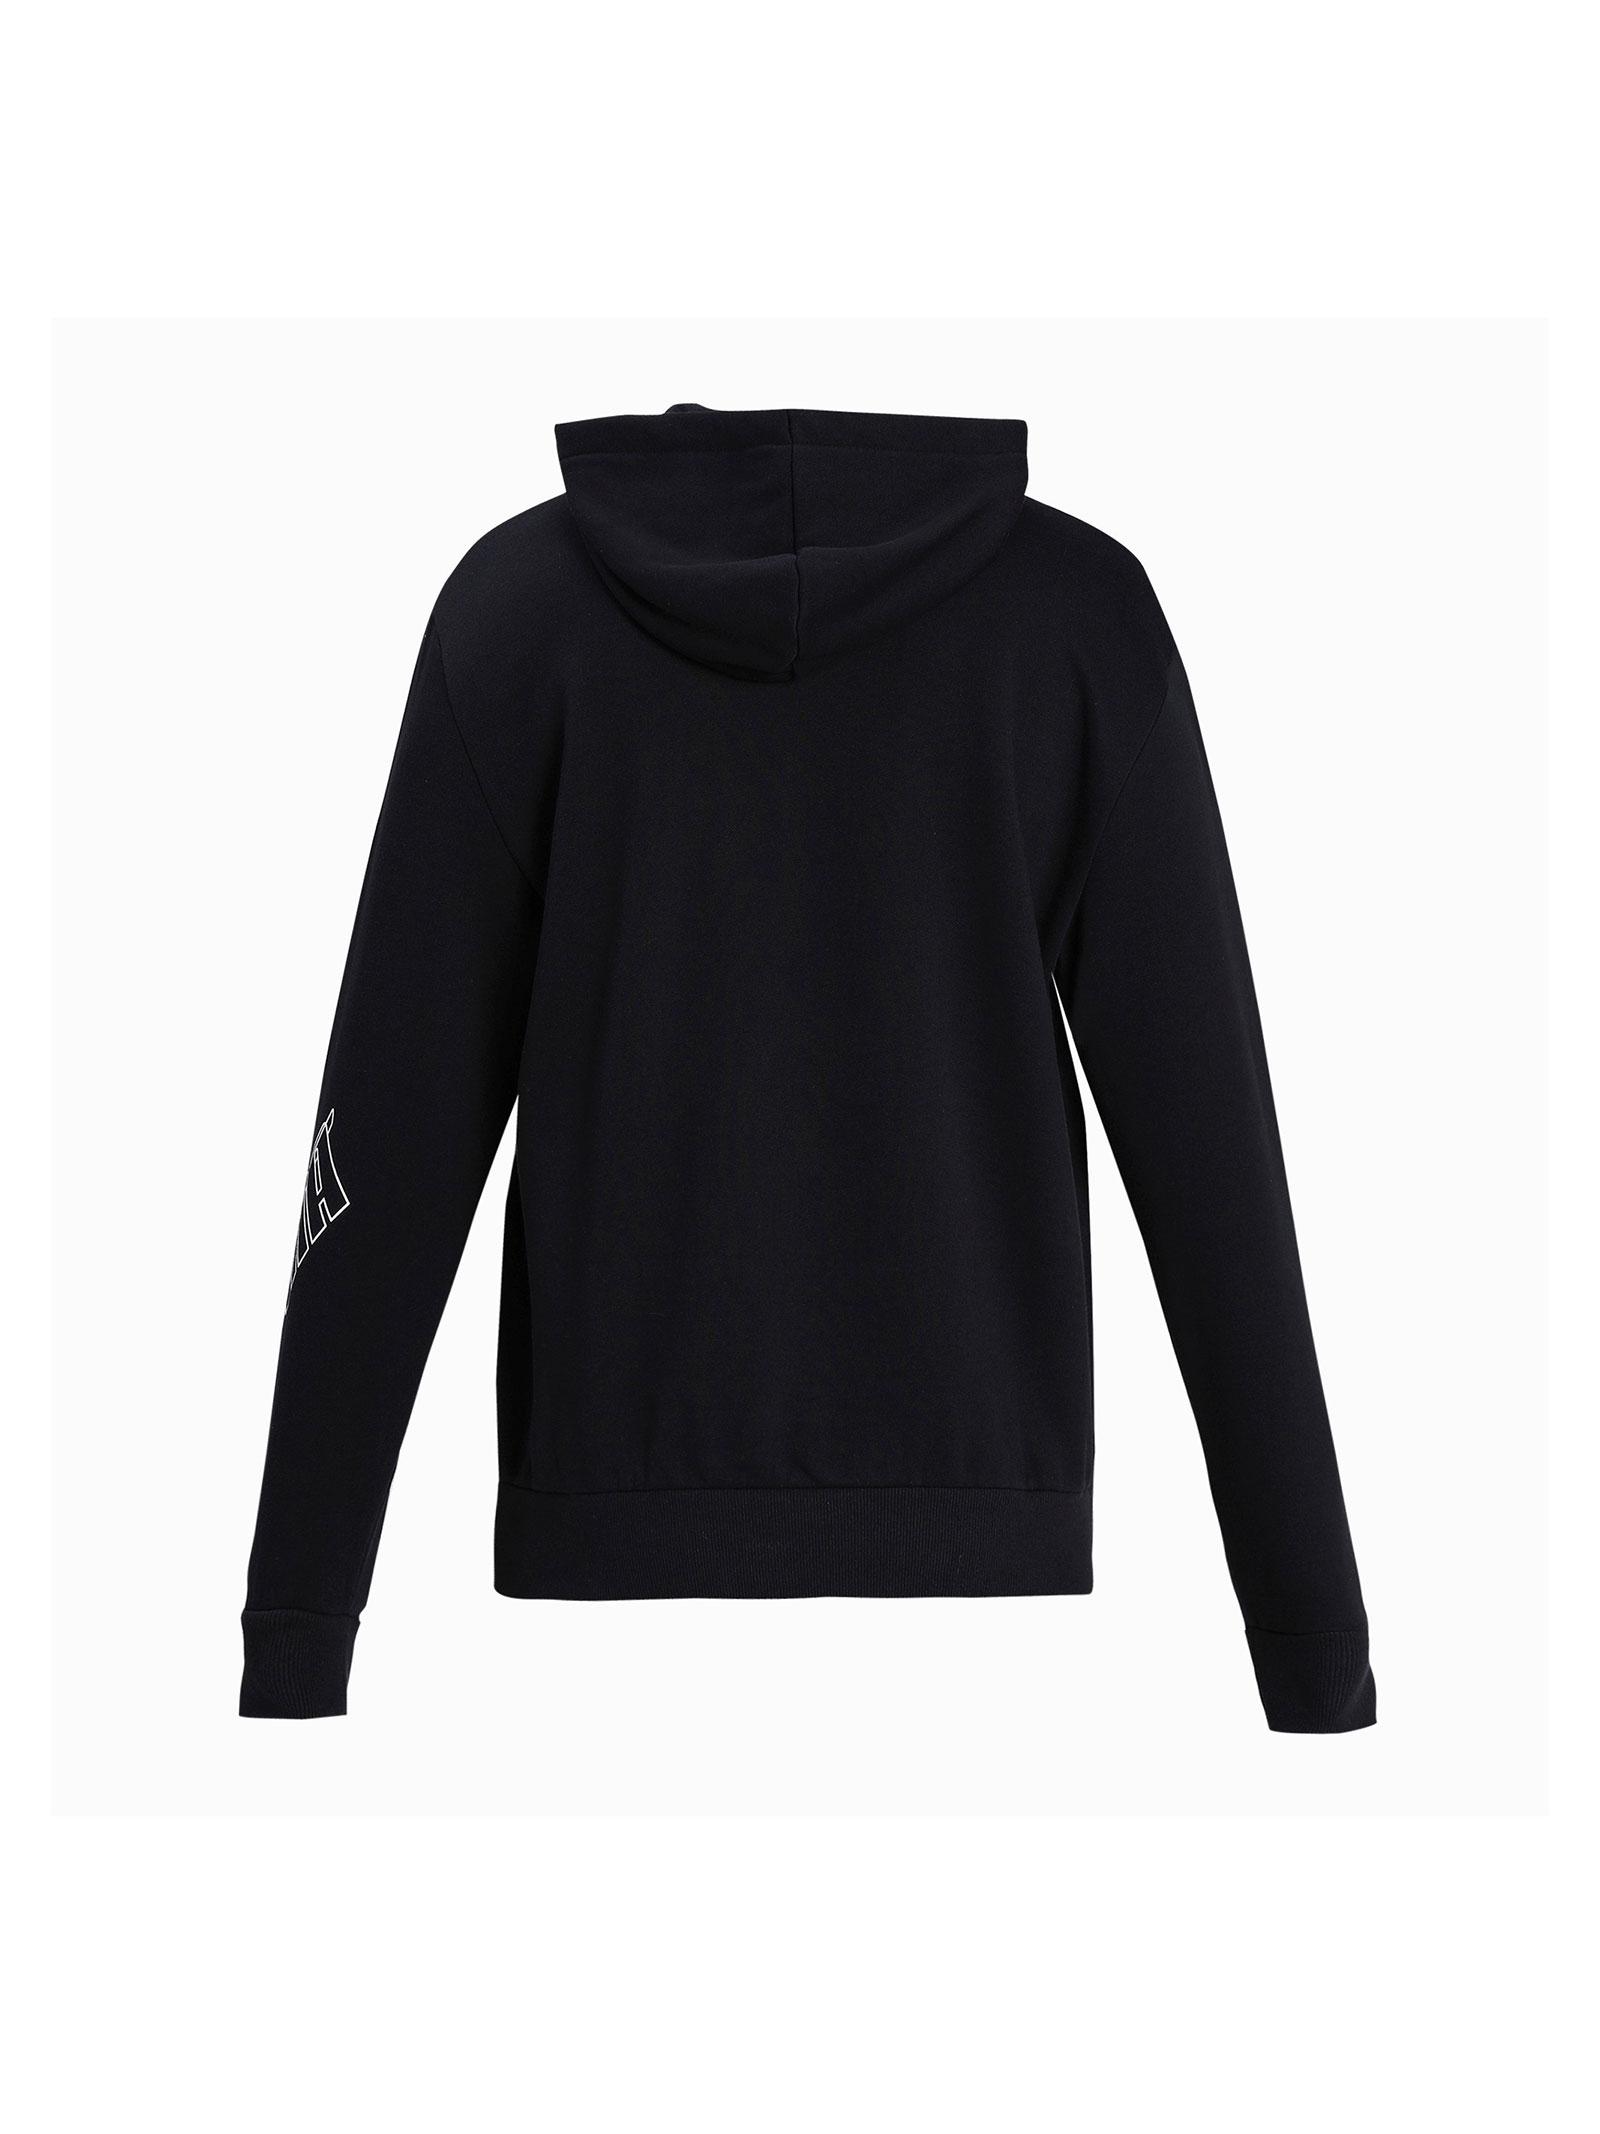 PUMA | Sweatshirts | 583494-01